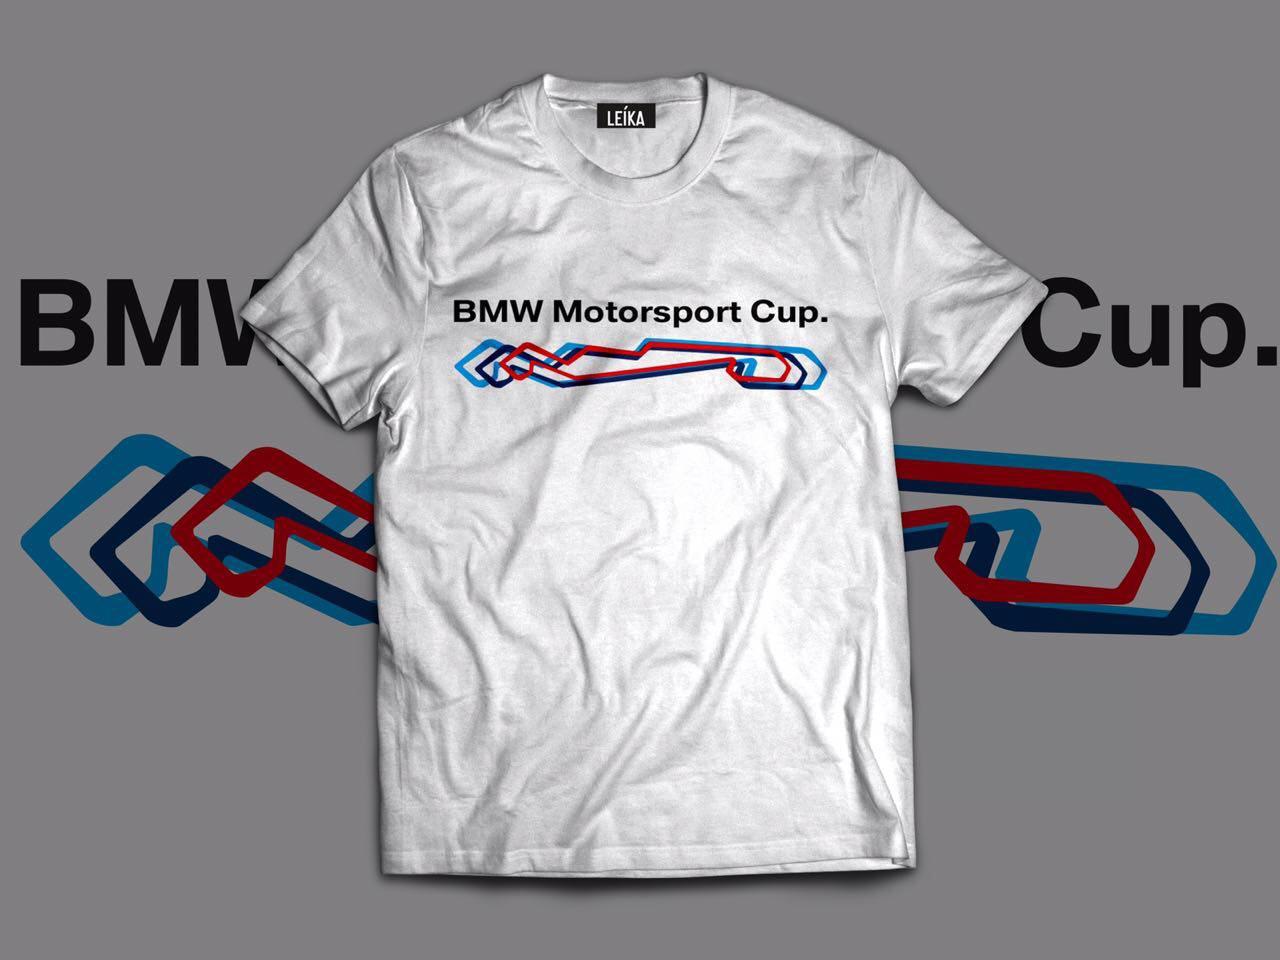 bmw, bmwclub, bmwclubspb, bmwclubrussia, bmwmotorsportcup, bmwcup, timeattack, autodromspb